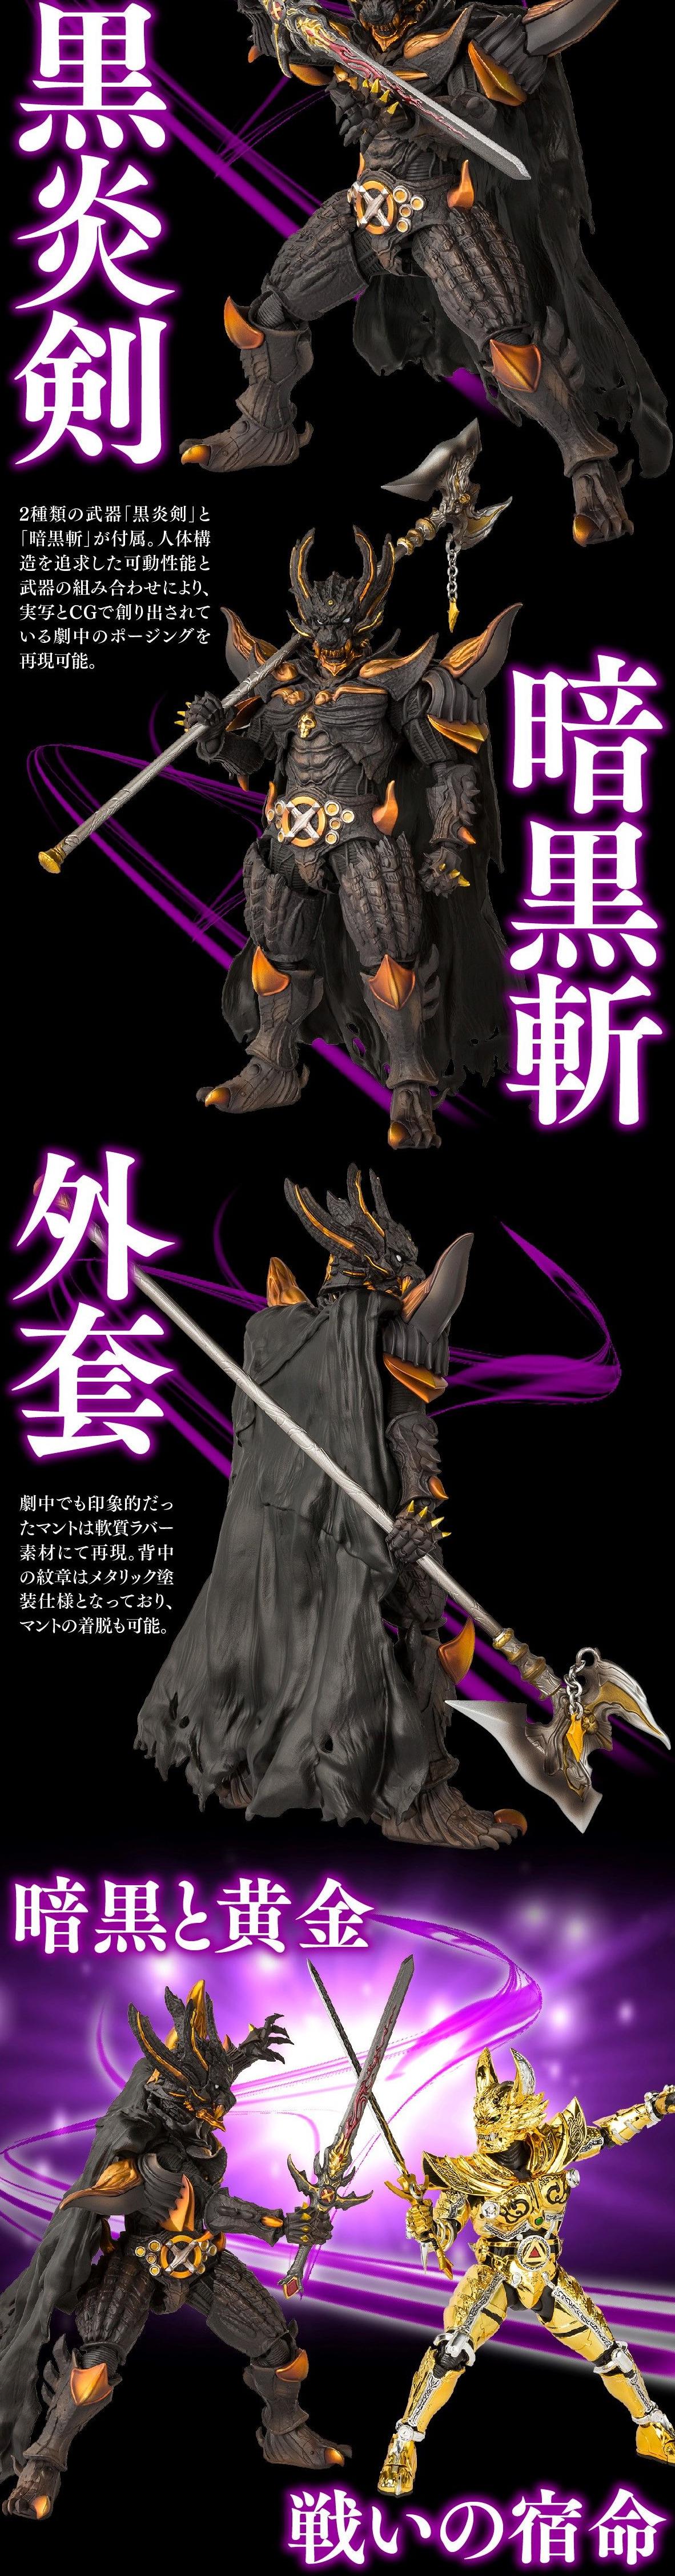 Figuarts(真骨彫製法) 暗黒騎士キバ予約3